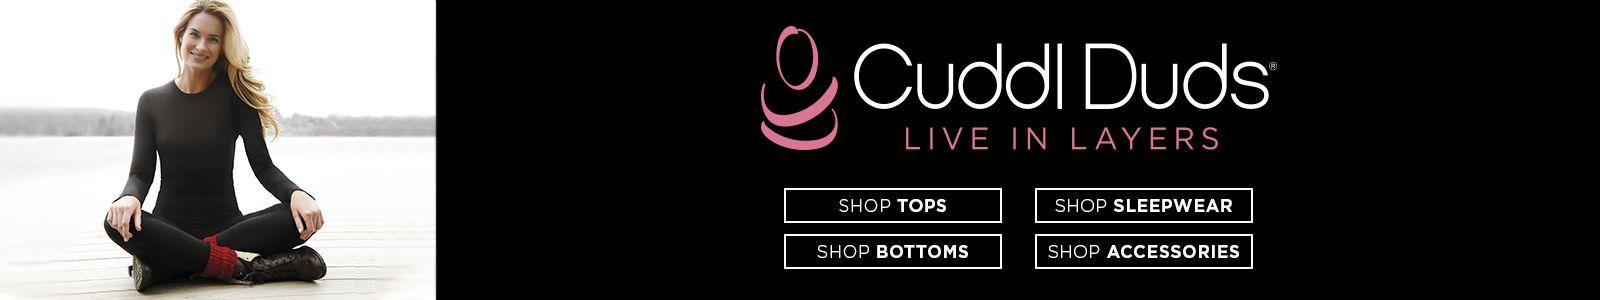 Cuddl Duds, Live in Layers, Shop Tops, Shop Sleepwear, Shop Bottoms, Shop Accessories